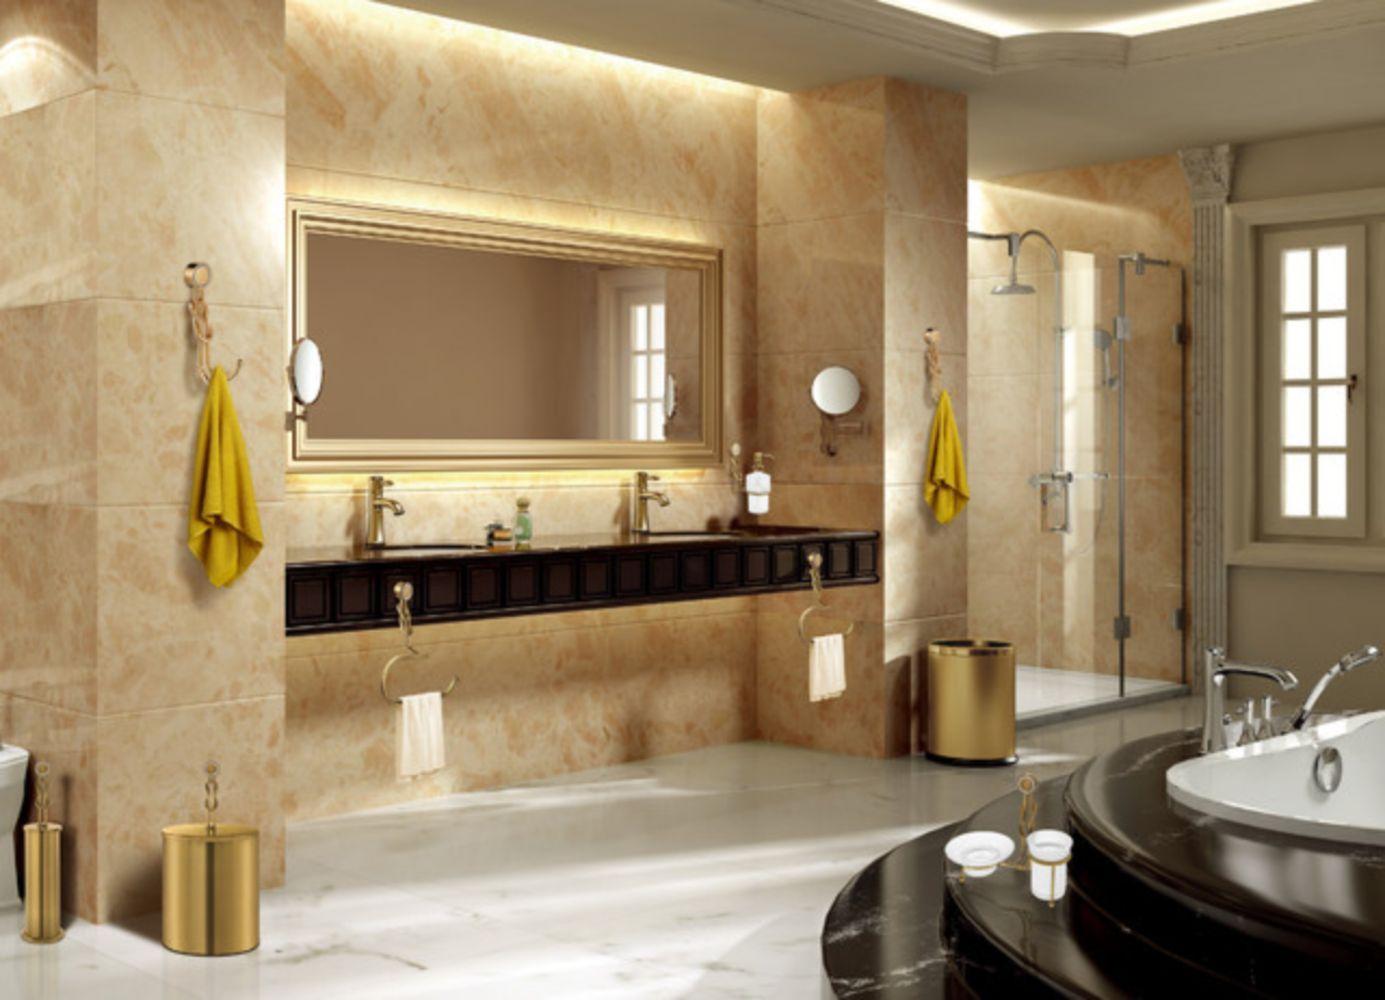 Mediterranean Bathroom Design Pleasing 40 Fabulous Mediterranean Bathroom Design Ideas  Mediterranean Design Inspiration